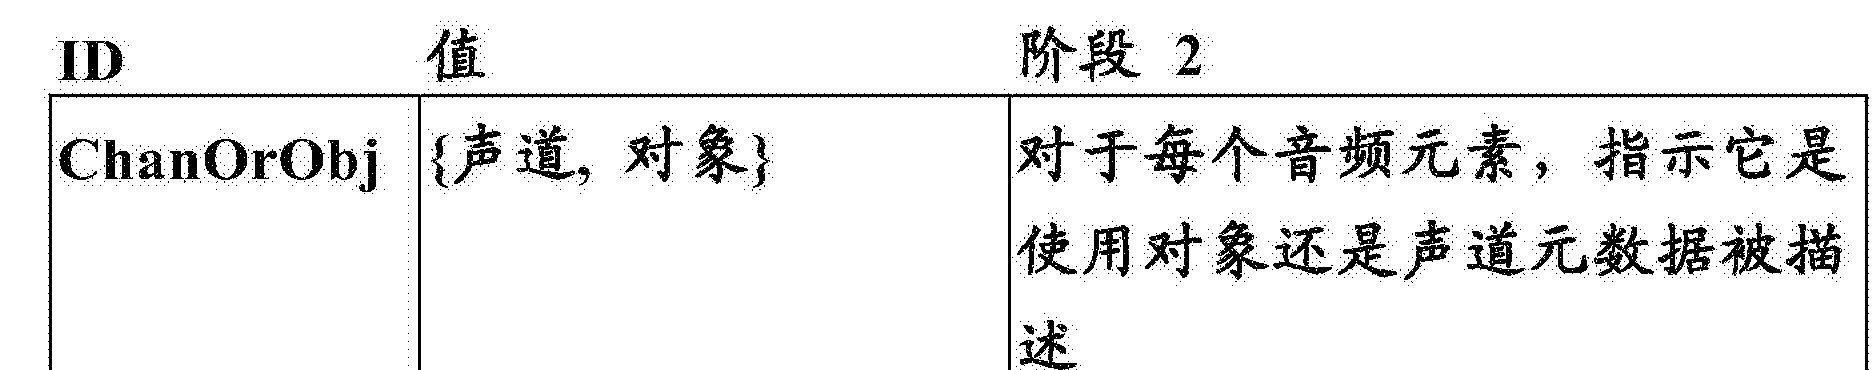 Figure CN105792086AD00271